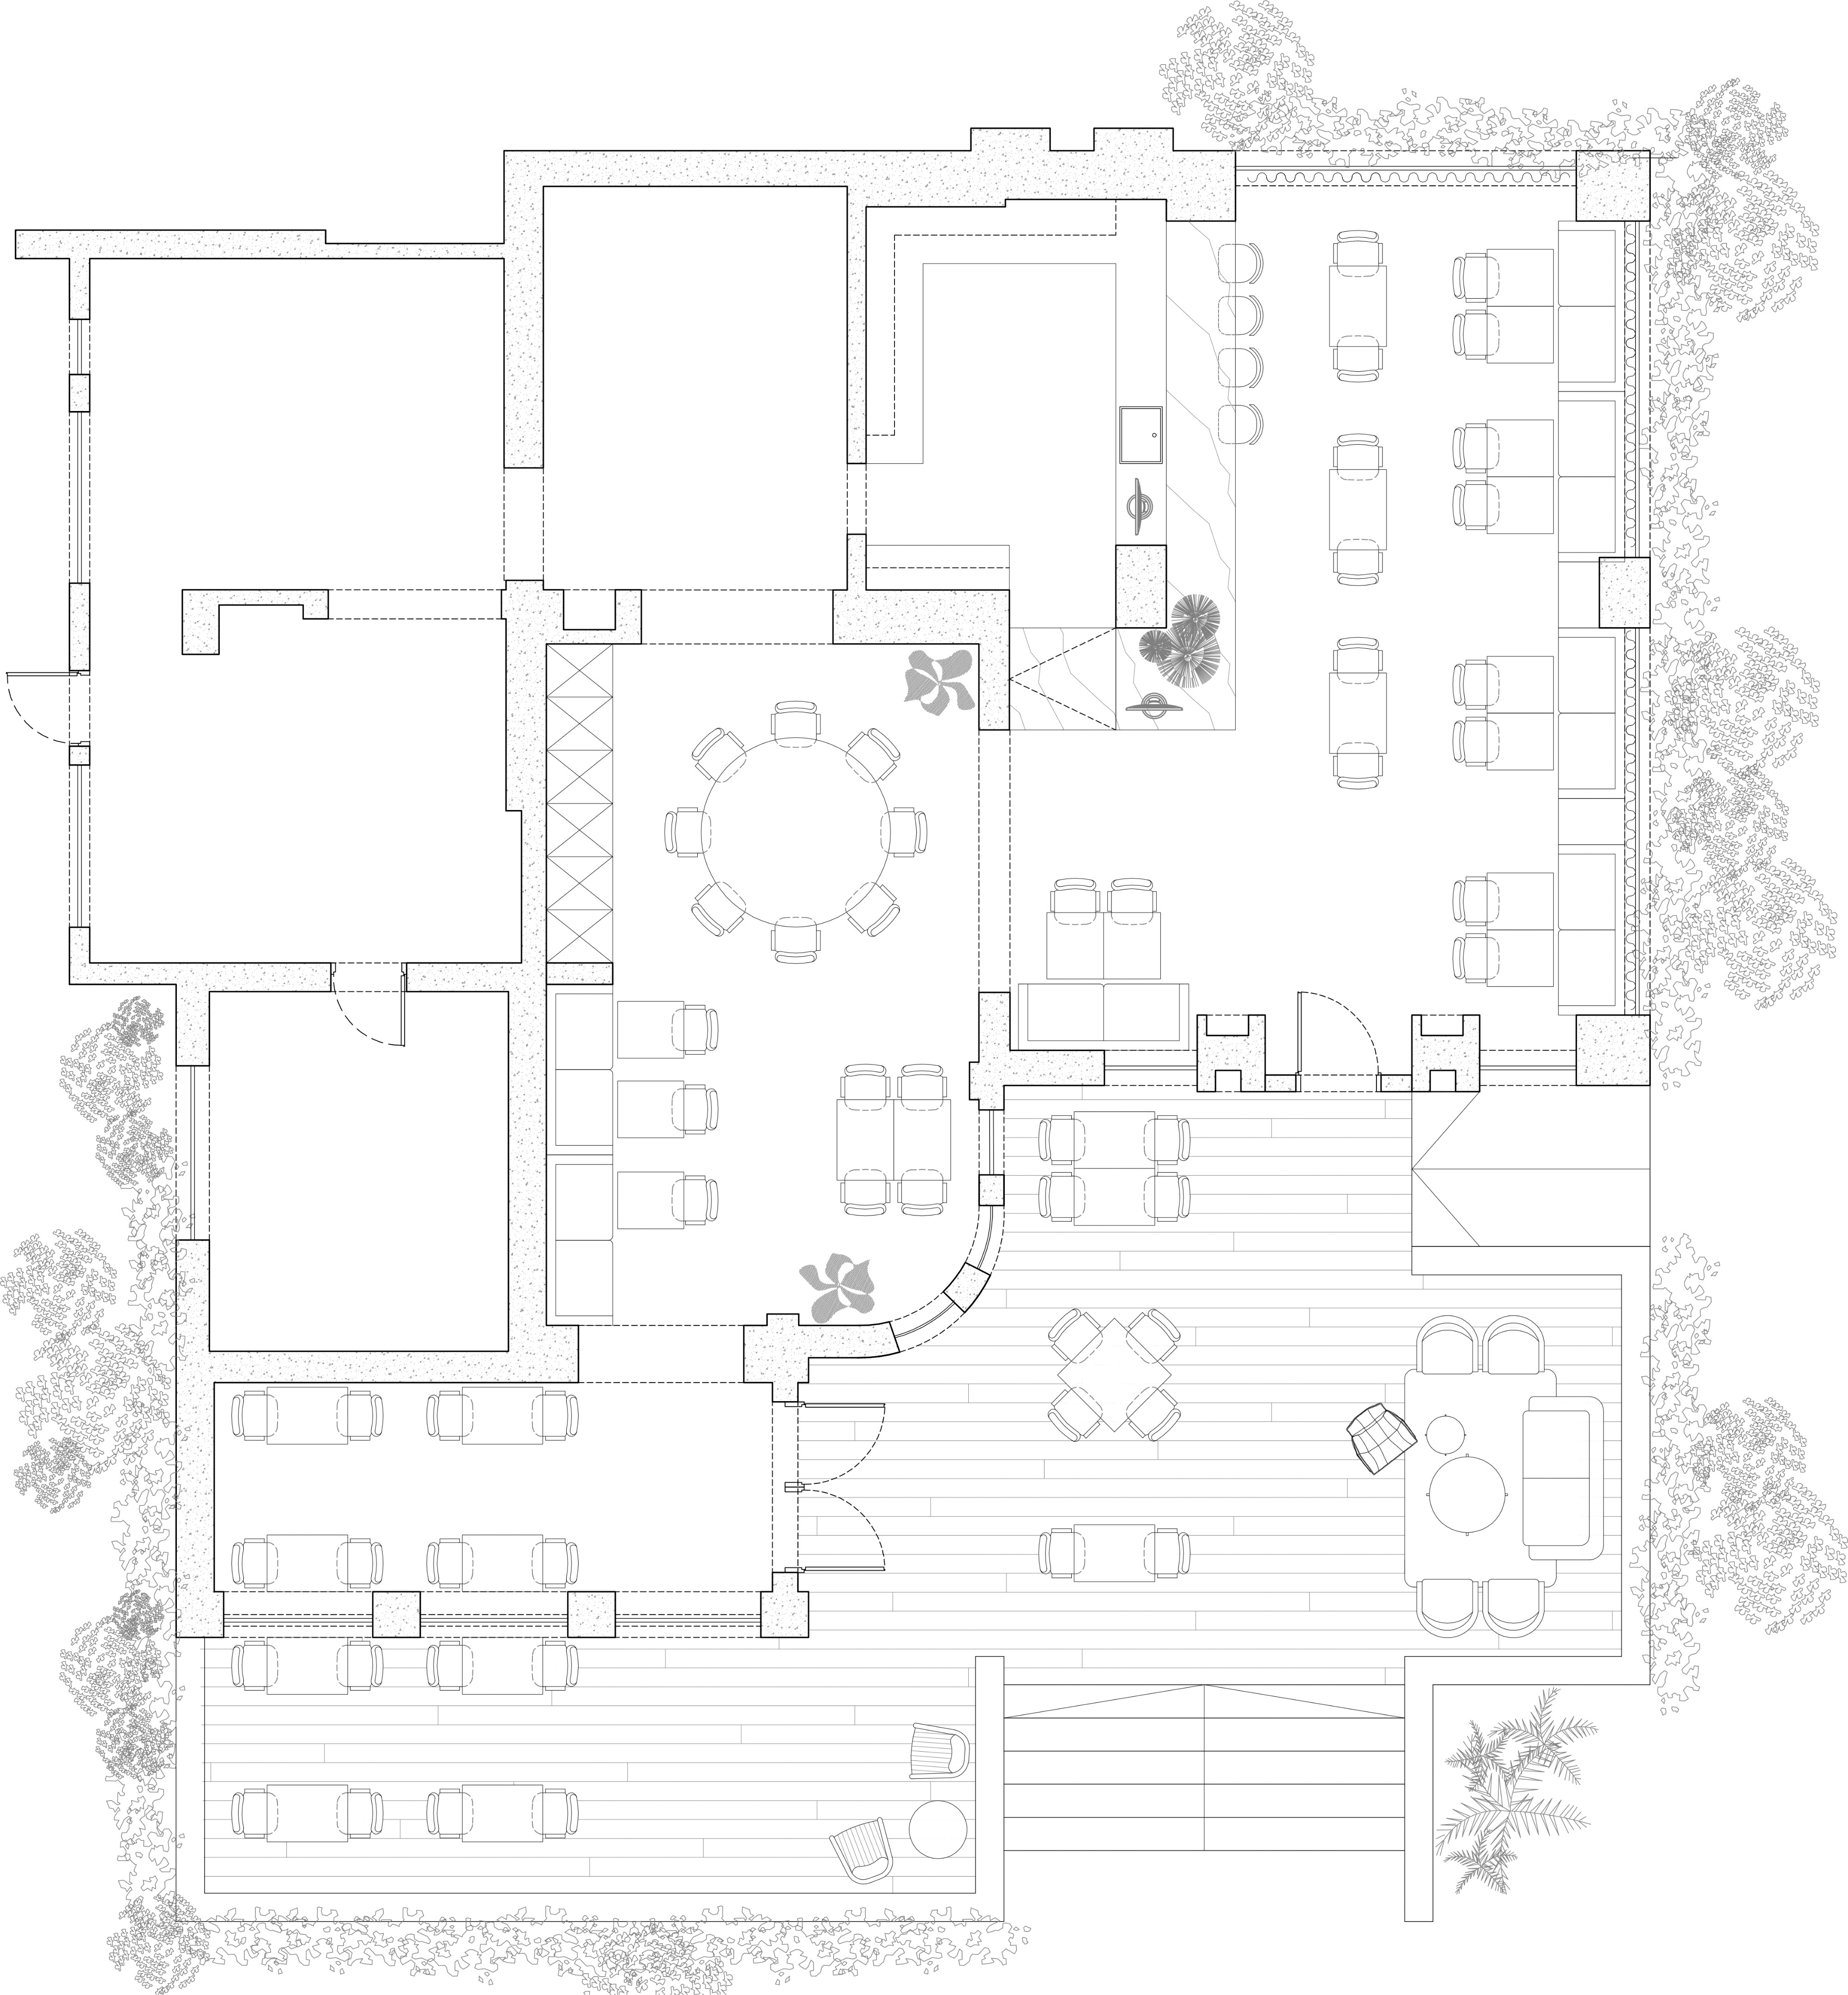 Izb8 Bar Restaurant Design Studio Etn